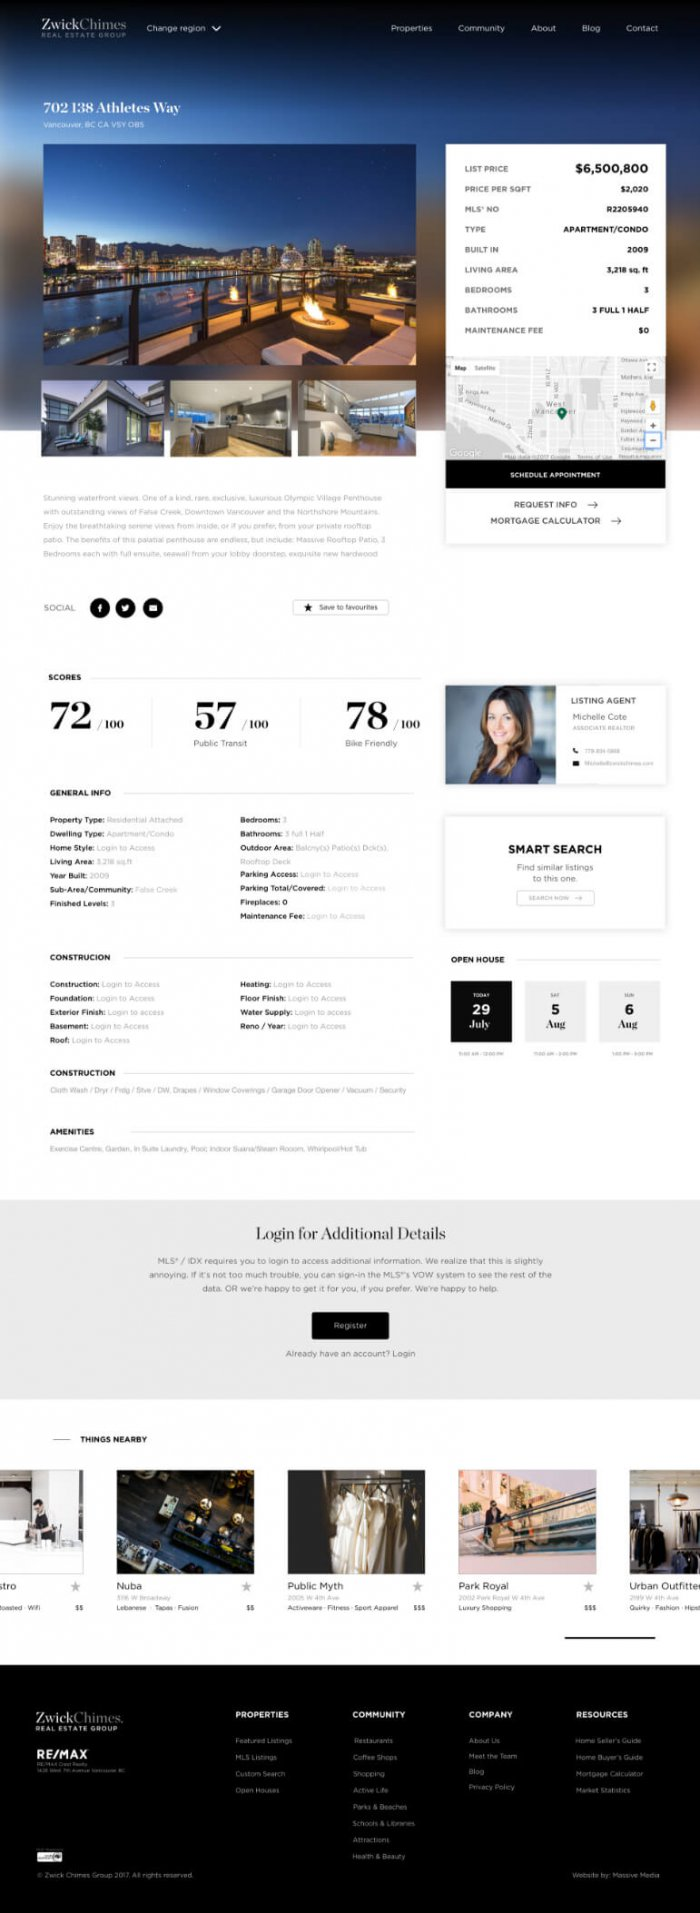 website design mockup for zwick chimes